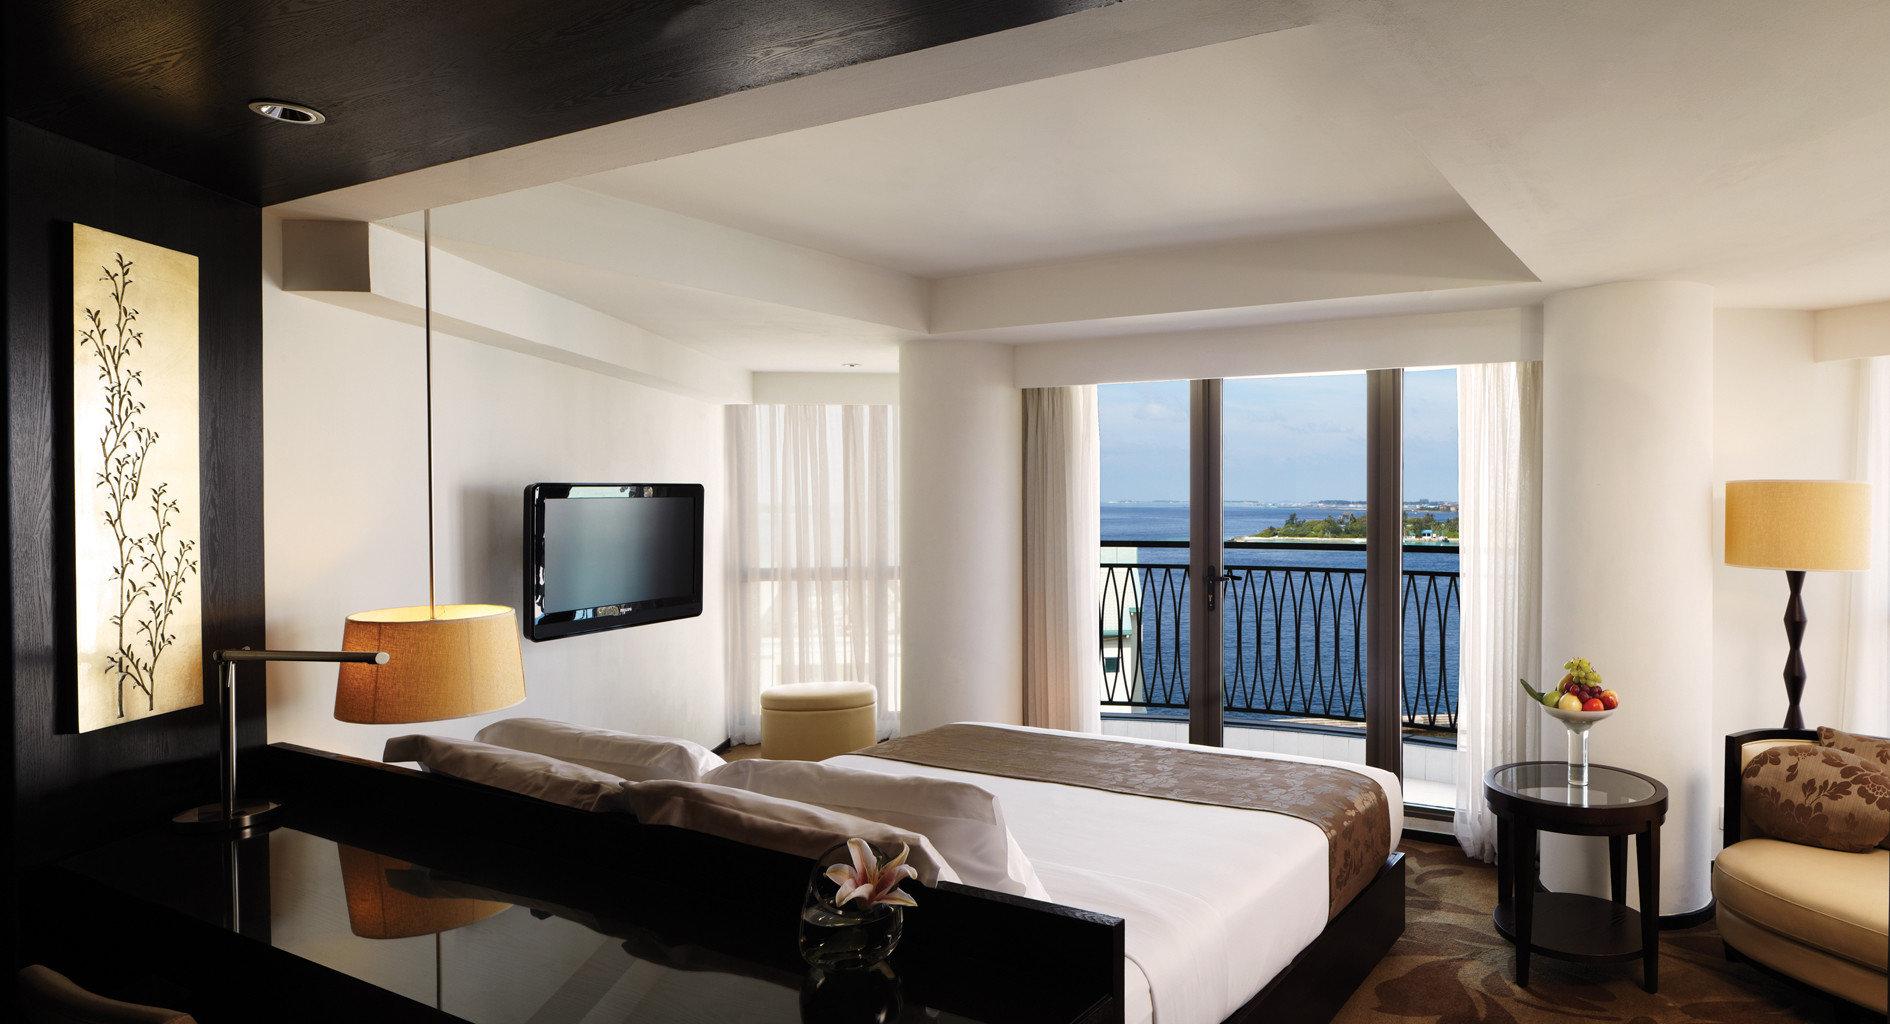 Balcony Bedroom Island Luxury Modern Suite property living room condominium home flat